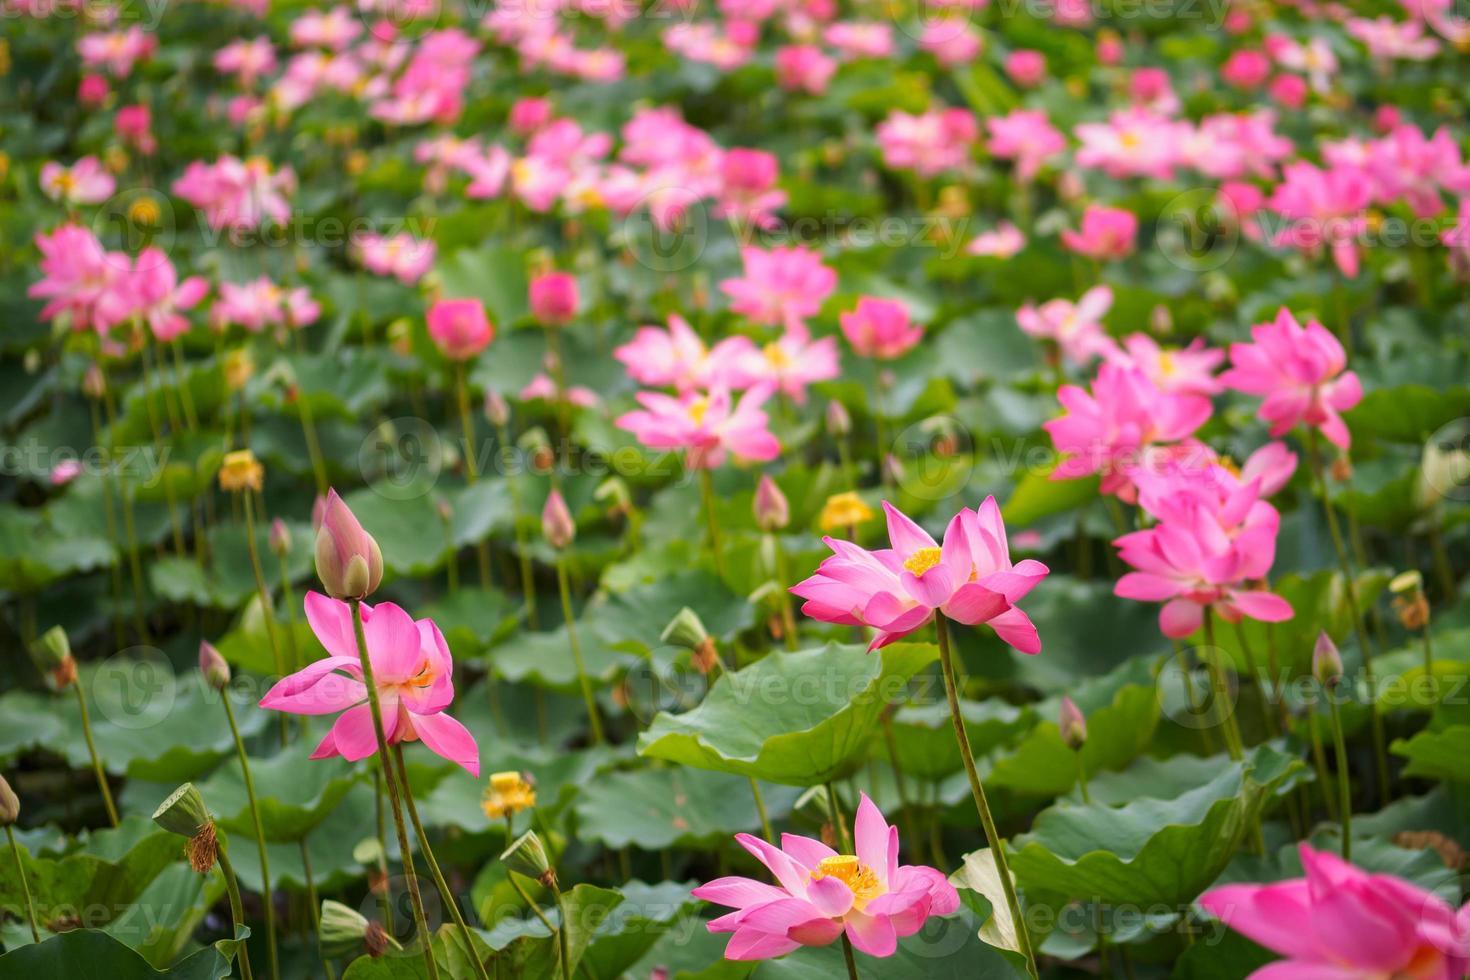 Feld der blühenden schönen Lotusblumen foto